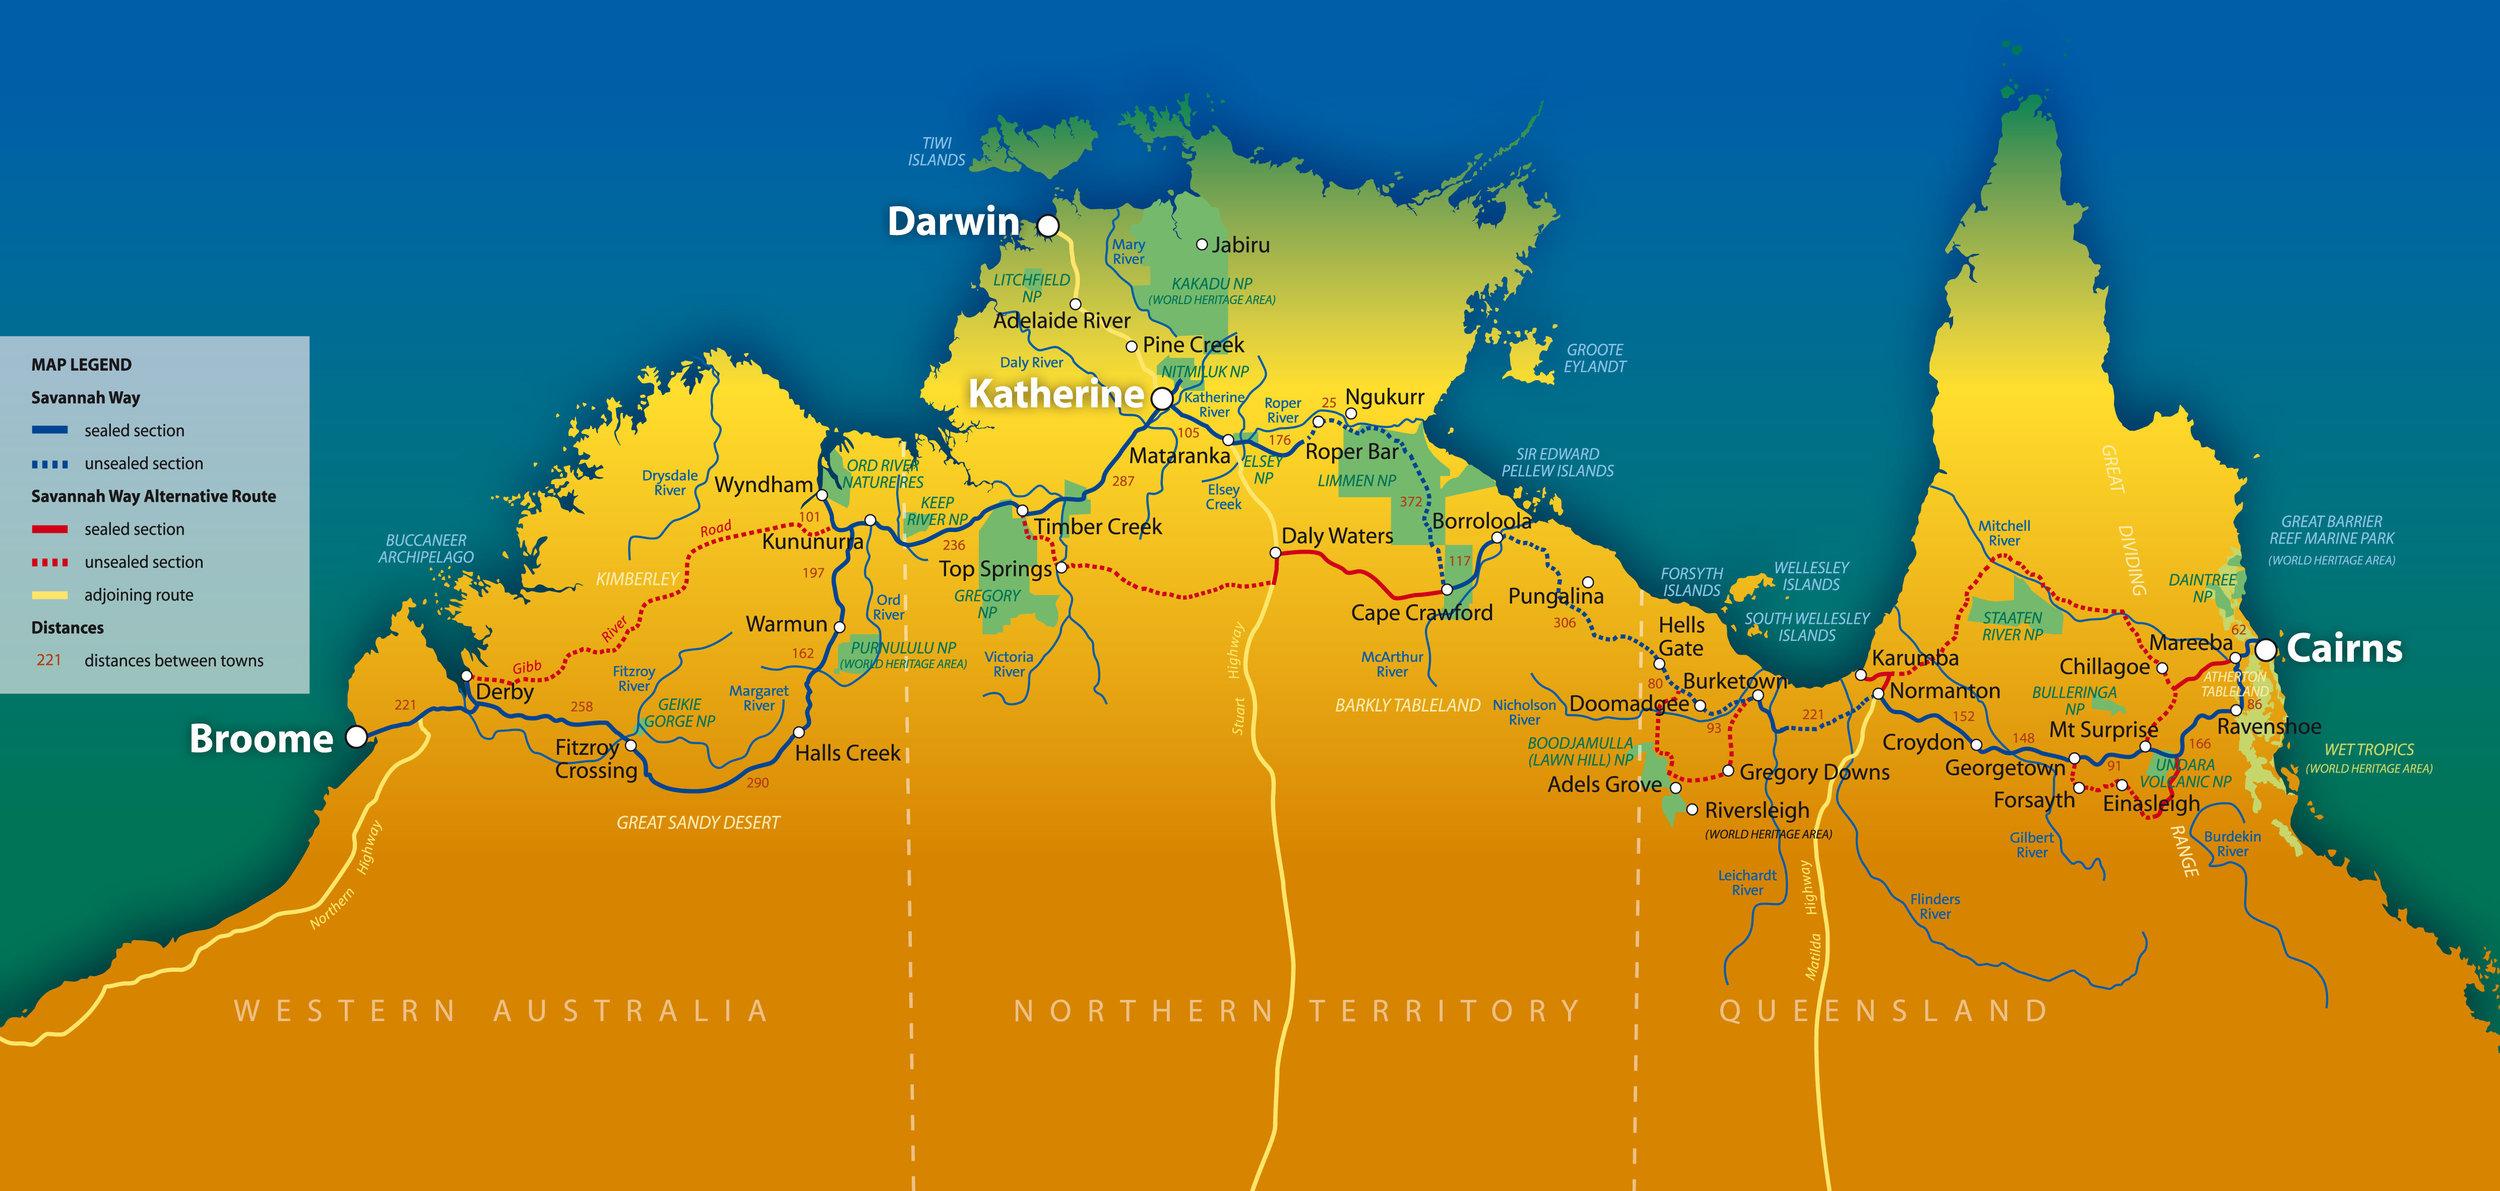 savannah-way-map.jpg